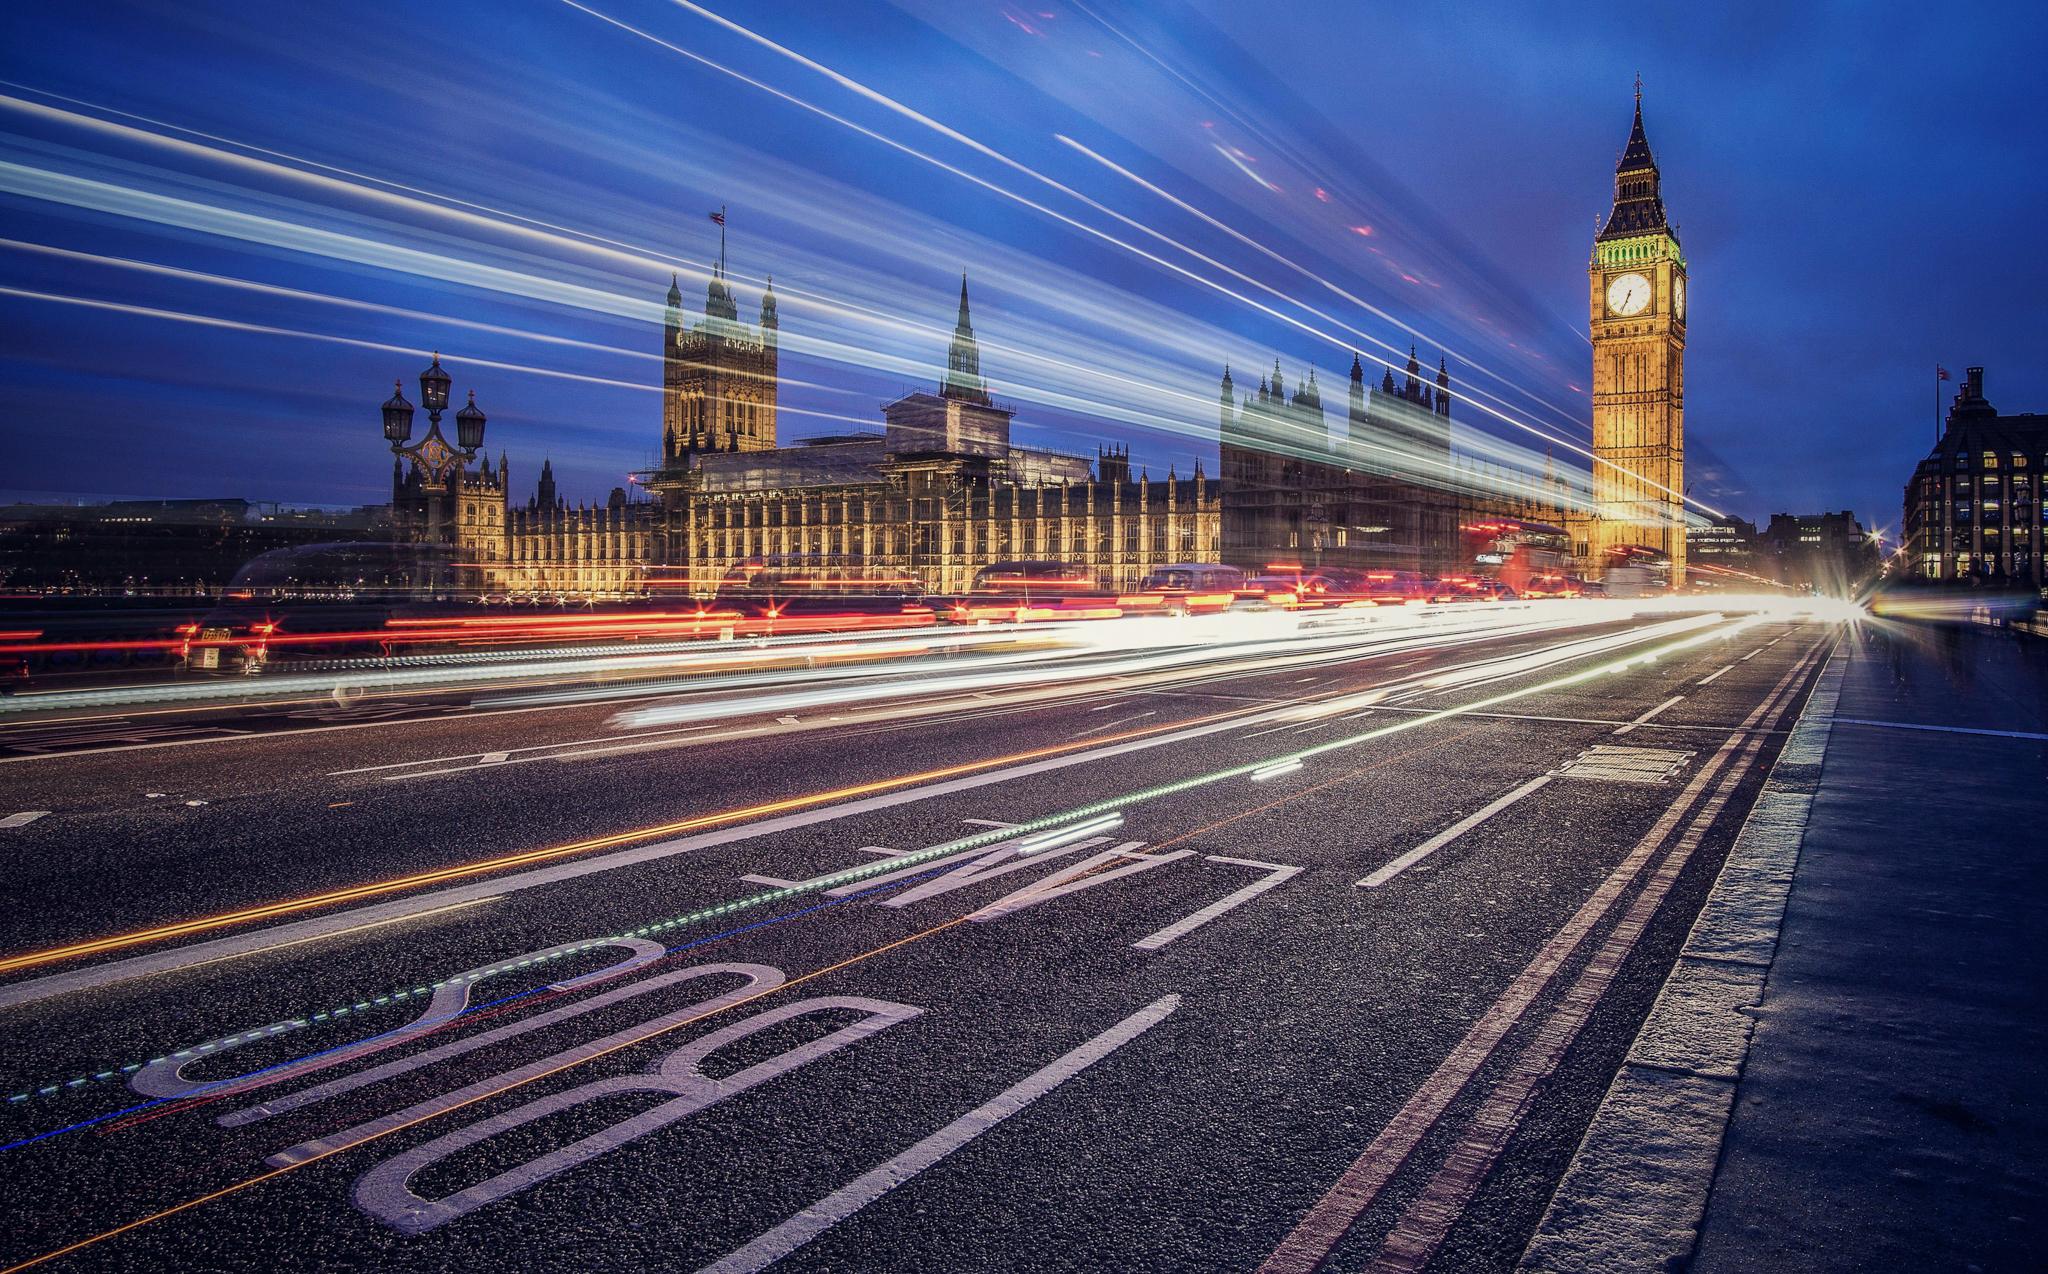 Westminster - London - England 2017